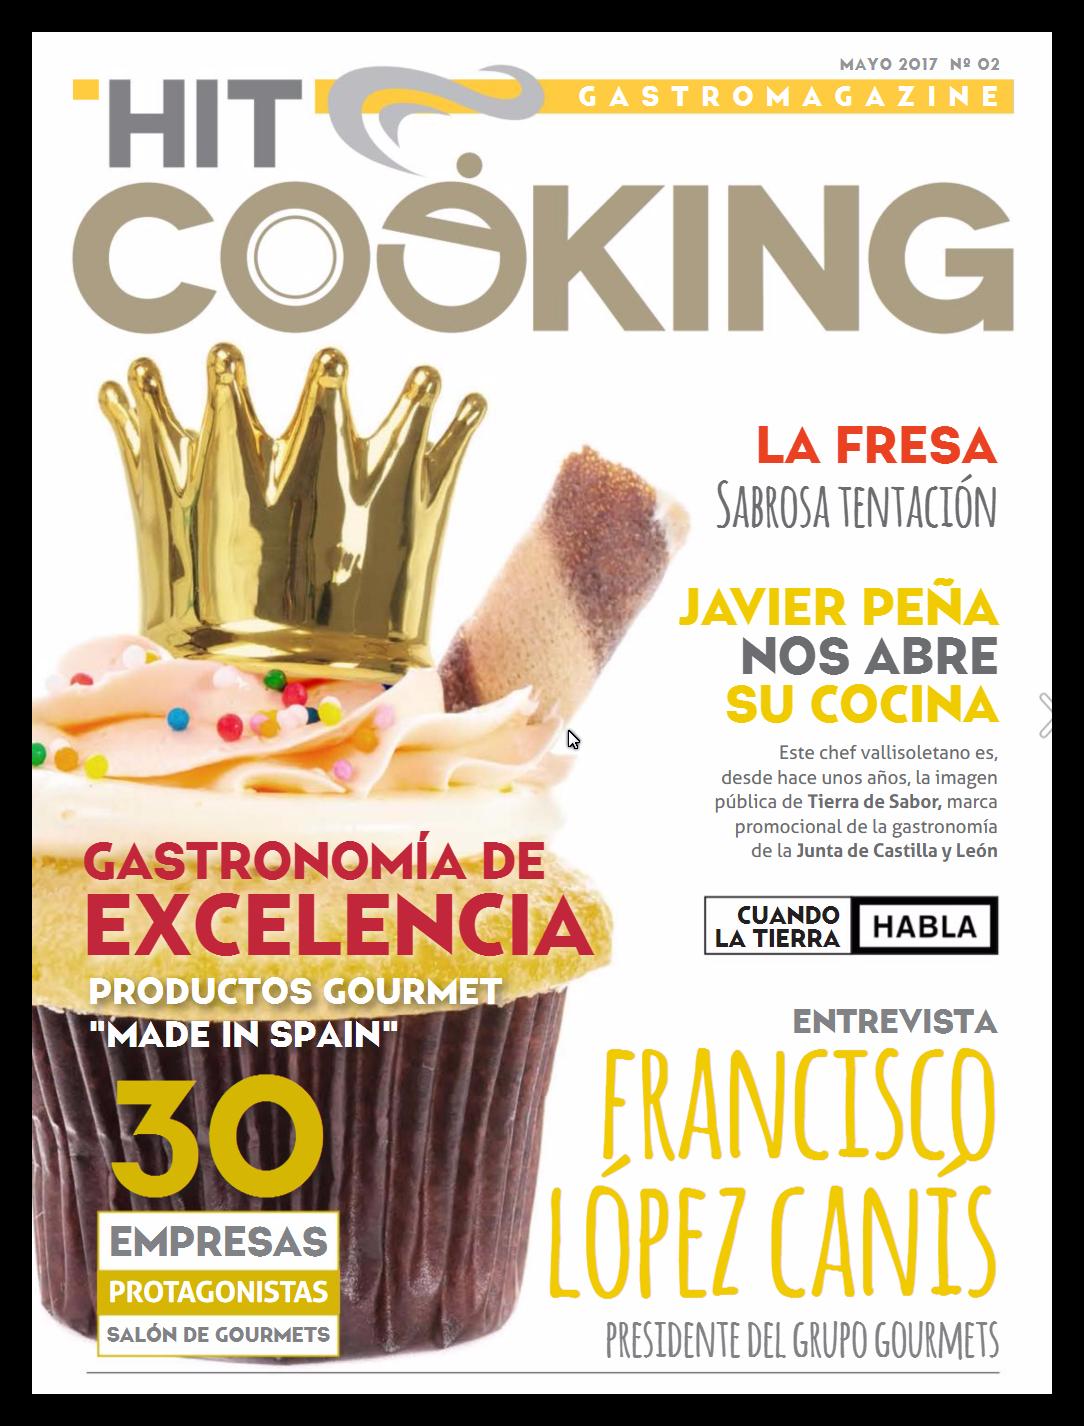 HITCOOKING GastroMagazine